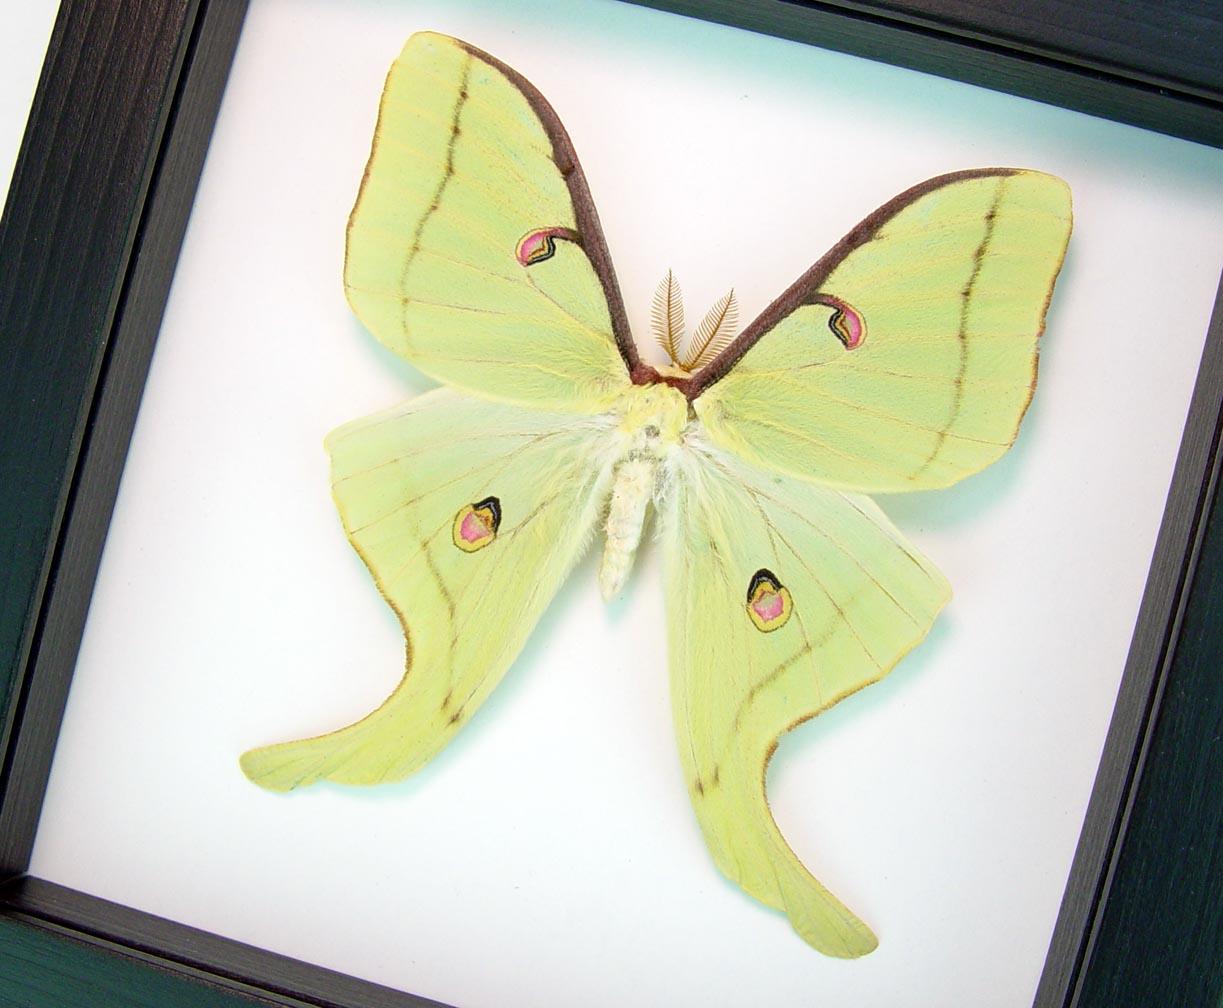 Actias luna male Luna Moth Classic Black display Excellent Color ooak